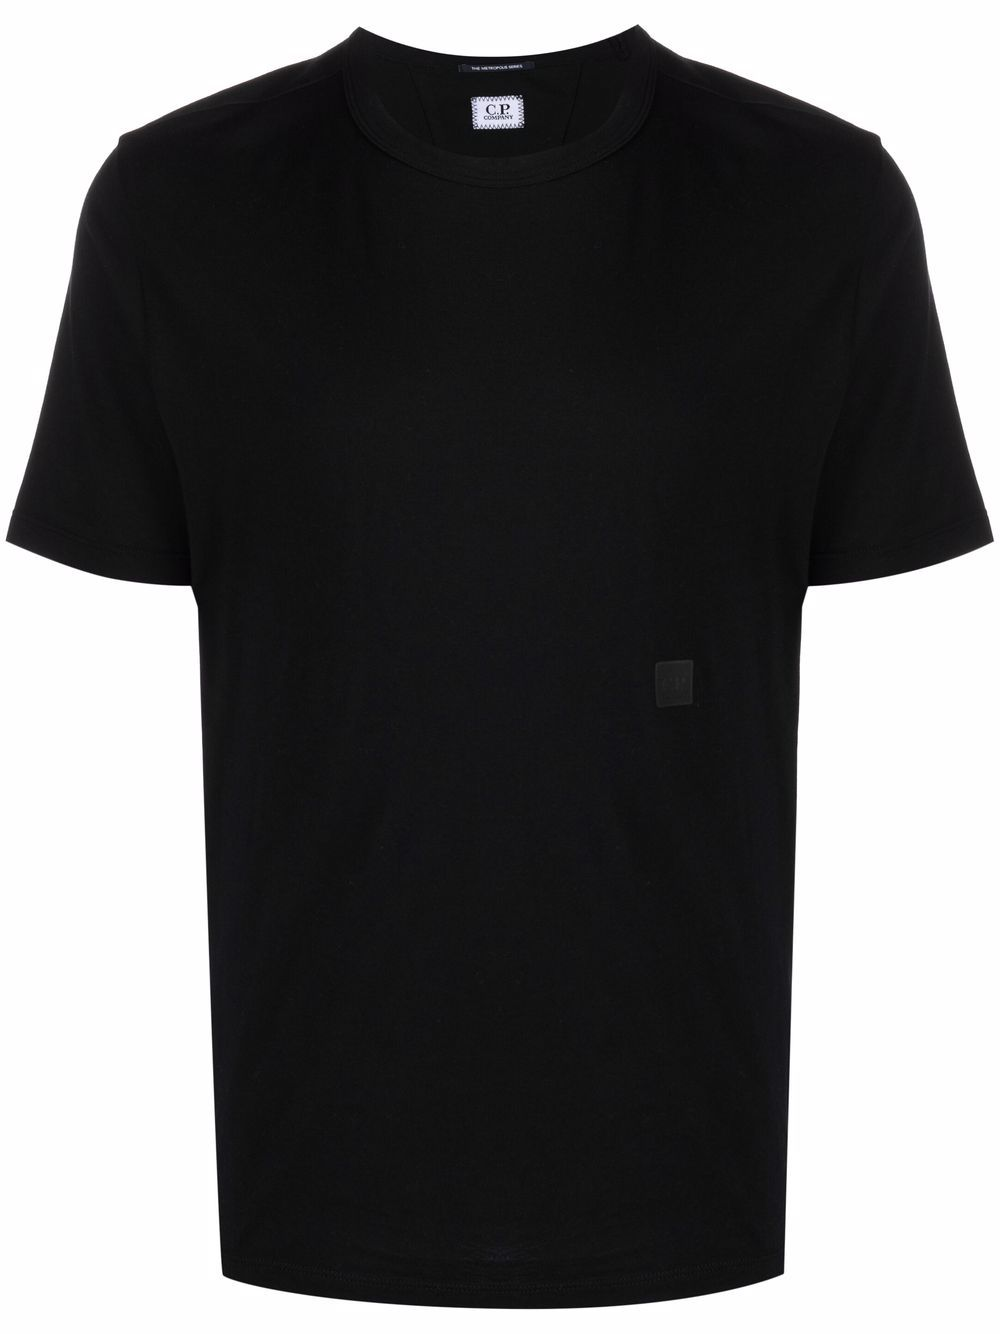 t-shirt con logo uomo nera in cotone C.P. COMPANY | T-shirt | 11CMTS045A005100W999